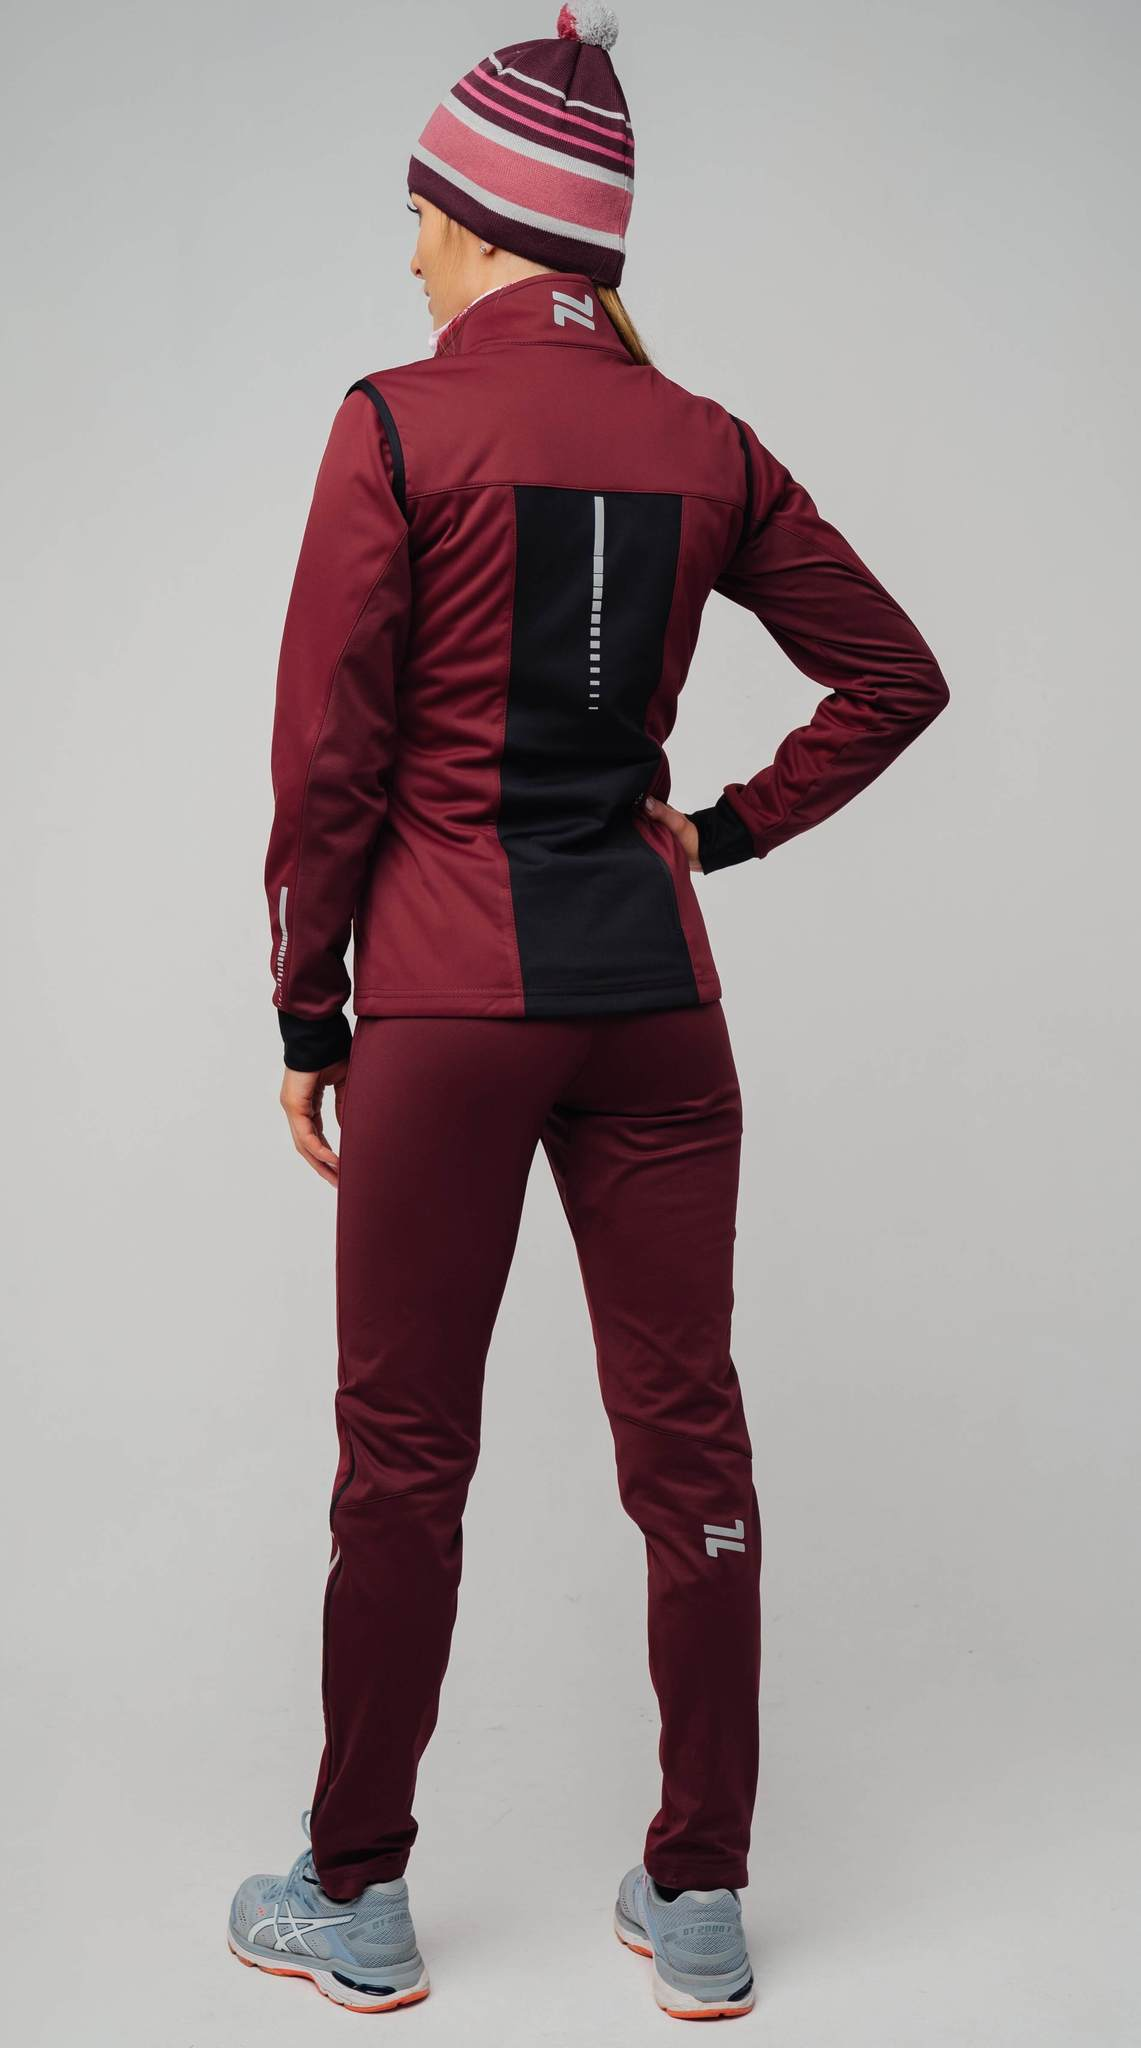 Nordski Pro лыжный костюм женский wine - 2